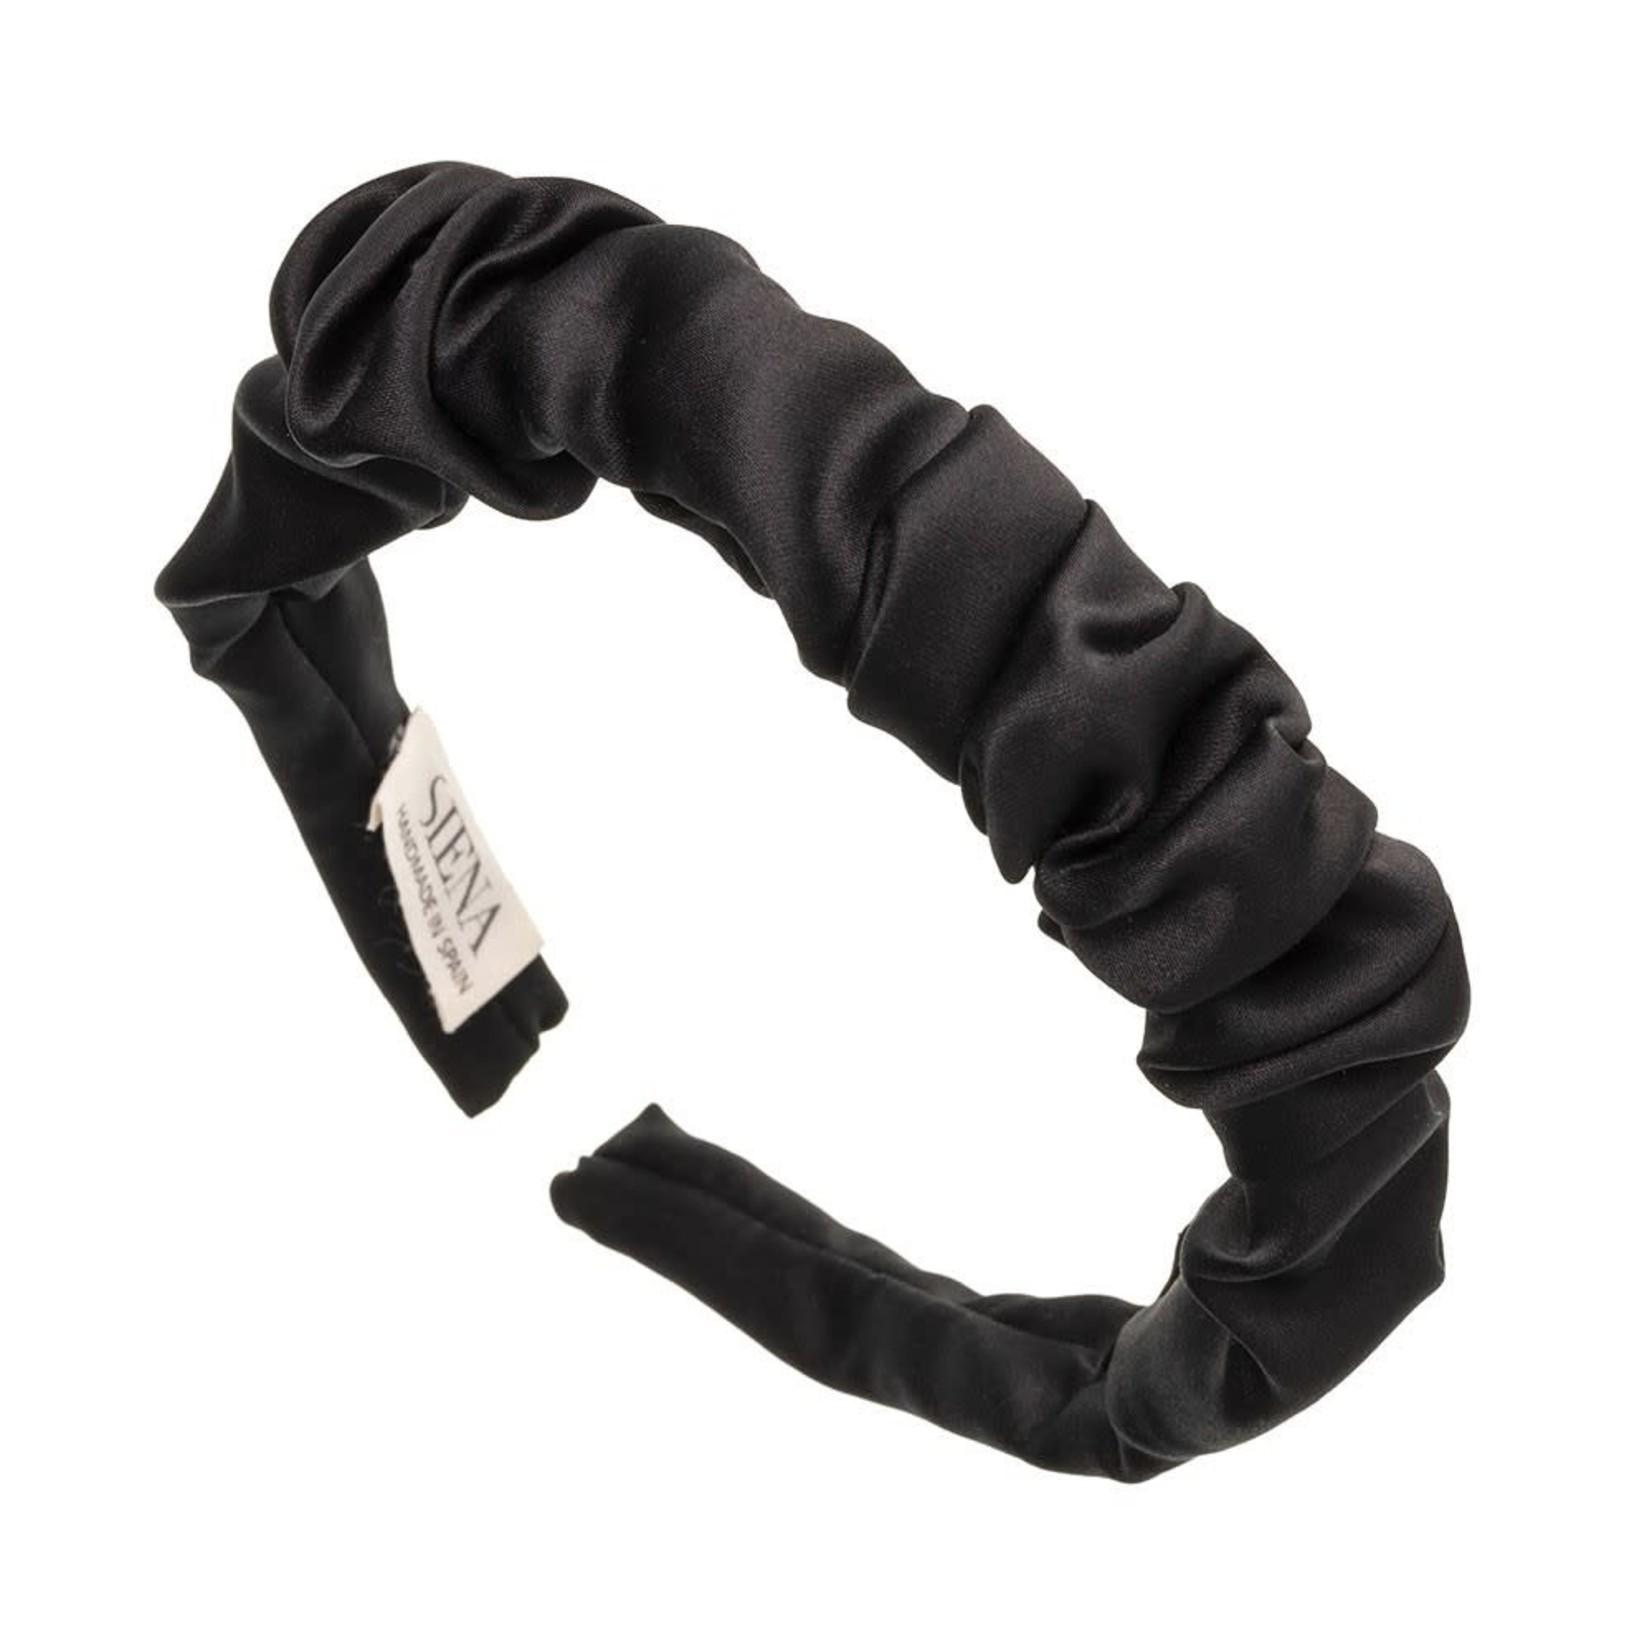 Hairband Scrunchie Satin - Black